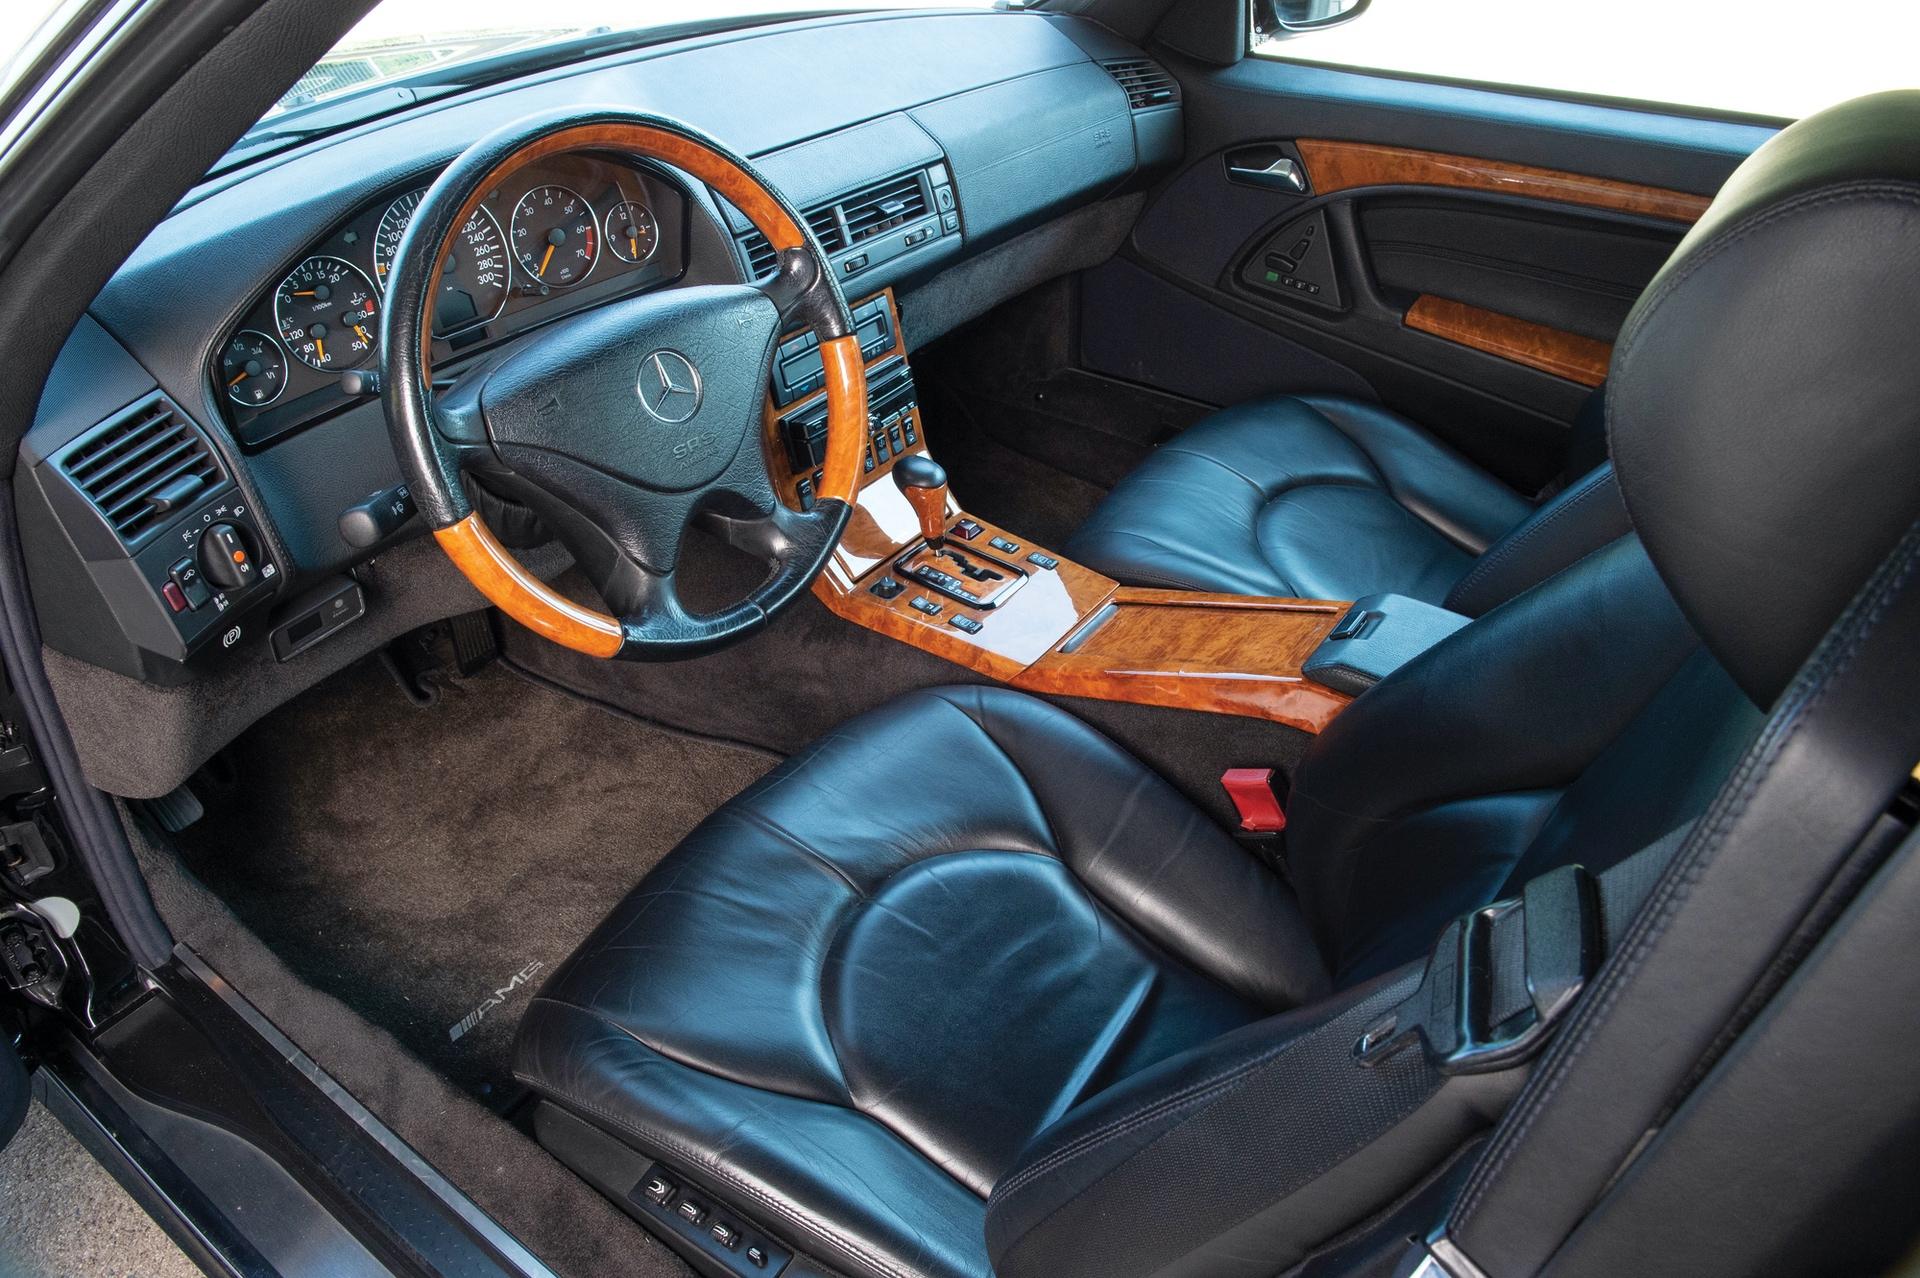 1999-Mercedes-Benz-SL-73-AMG-_3